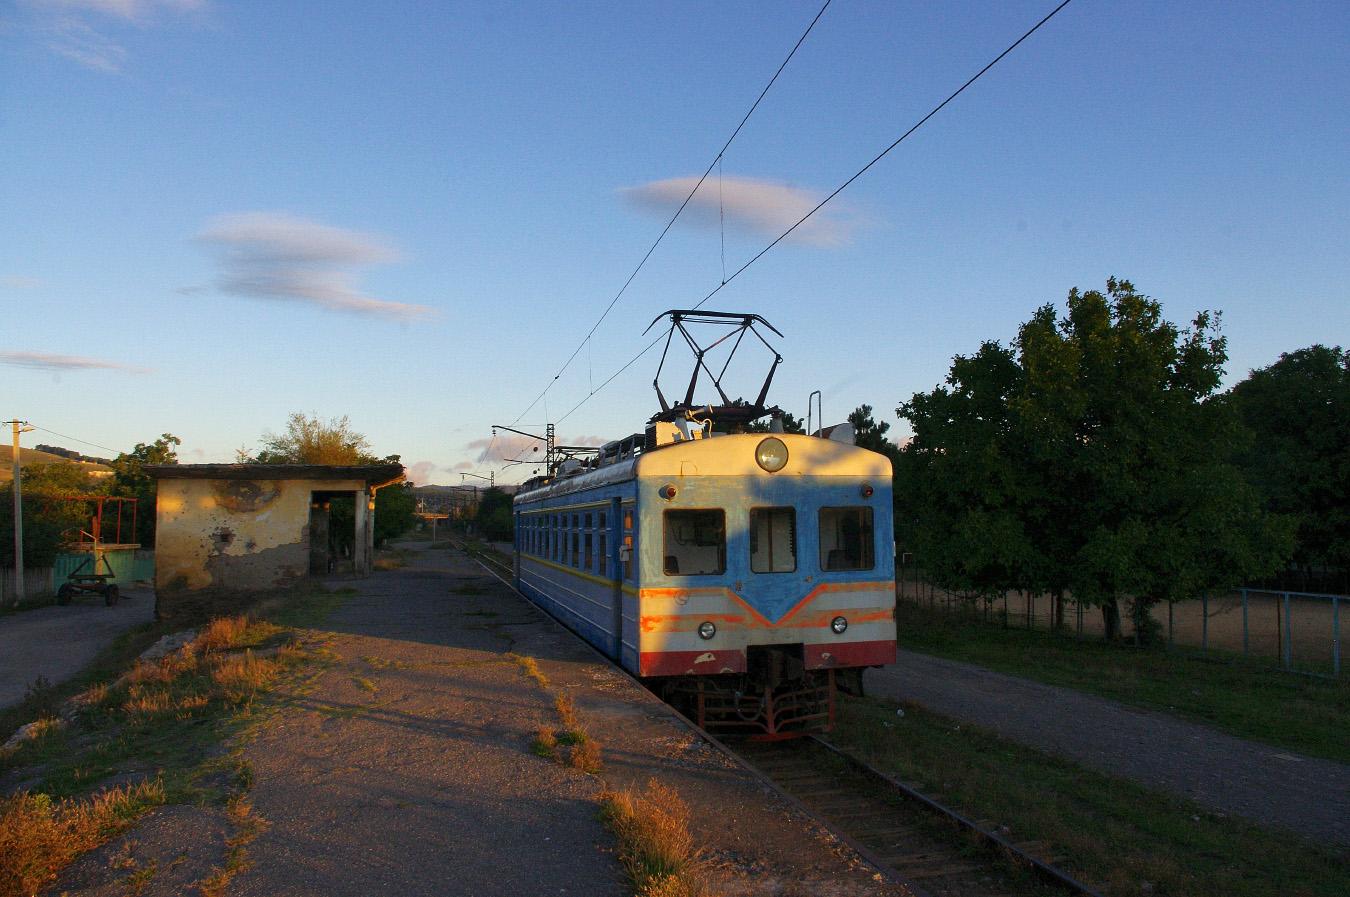 Електросекція Ср3-1510. Грузія, Шида-Картлі, Хашурі-Сурамі